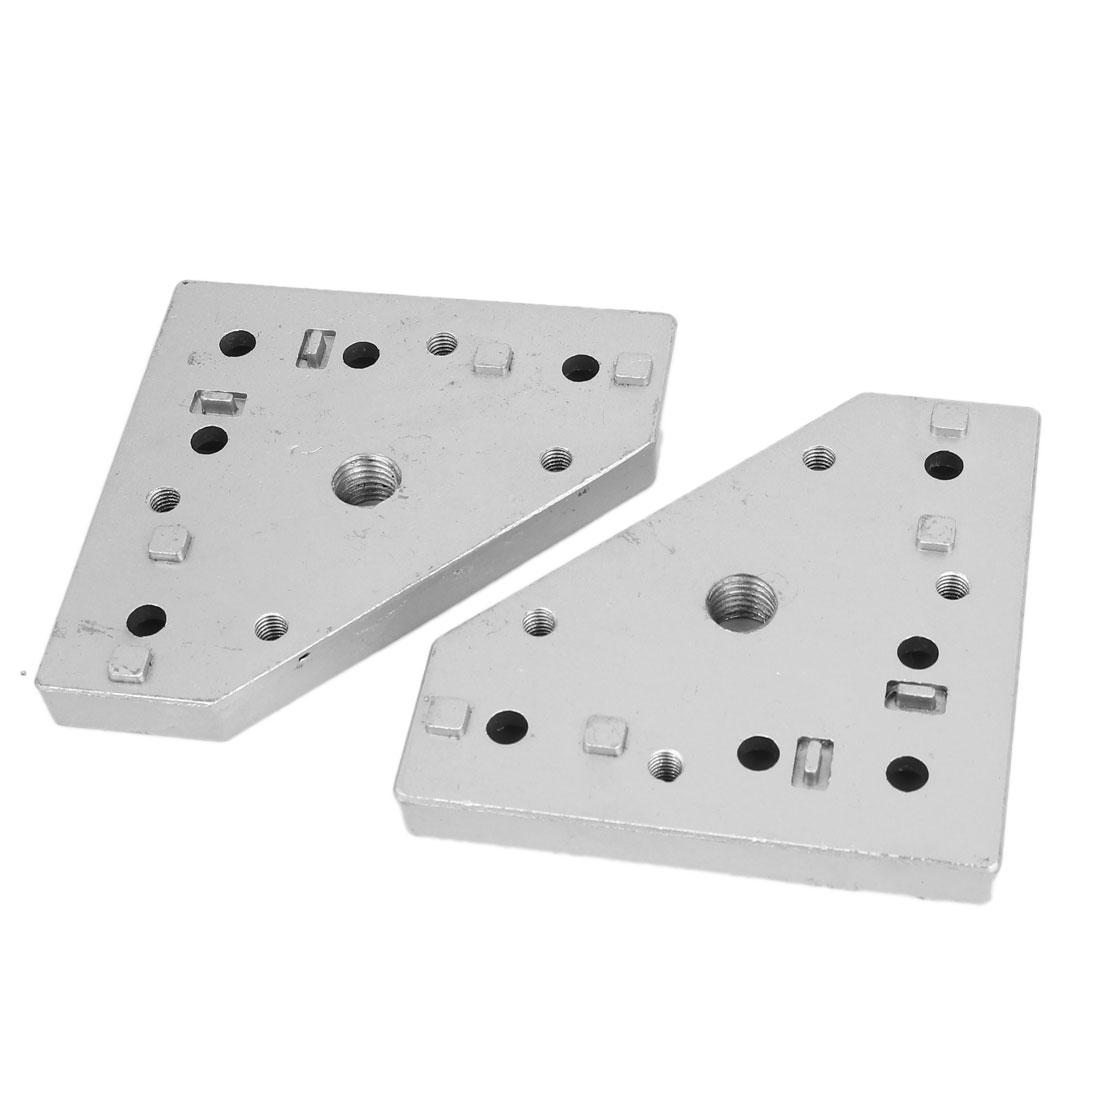 40 Metric Assembly Line Aluminium Caster Wheel Swivel Castor Fixing Plate Fastenings 2pcs